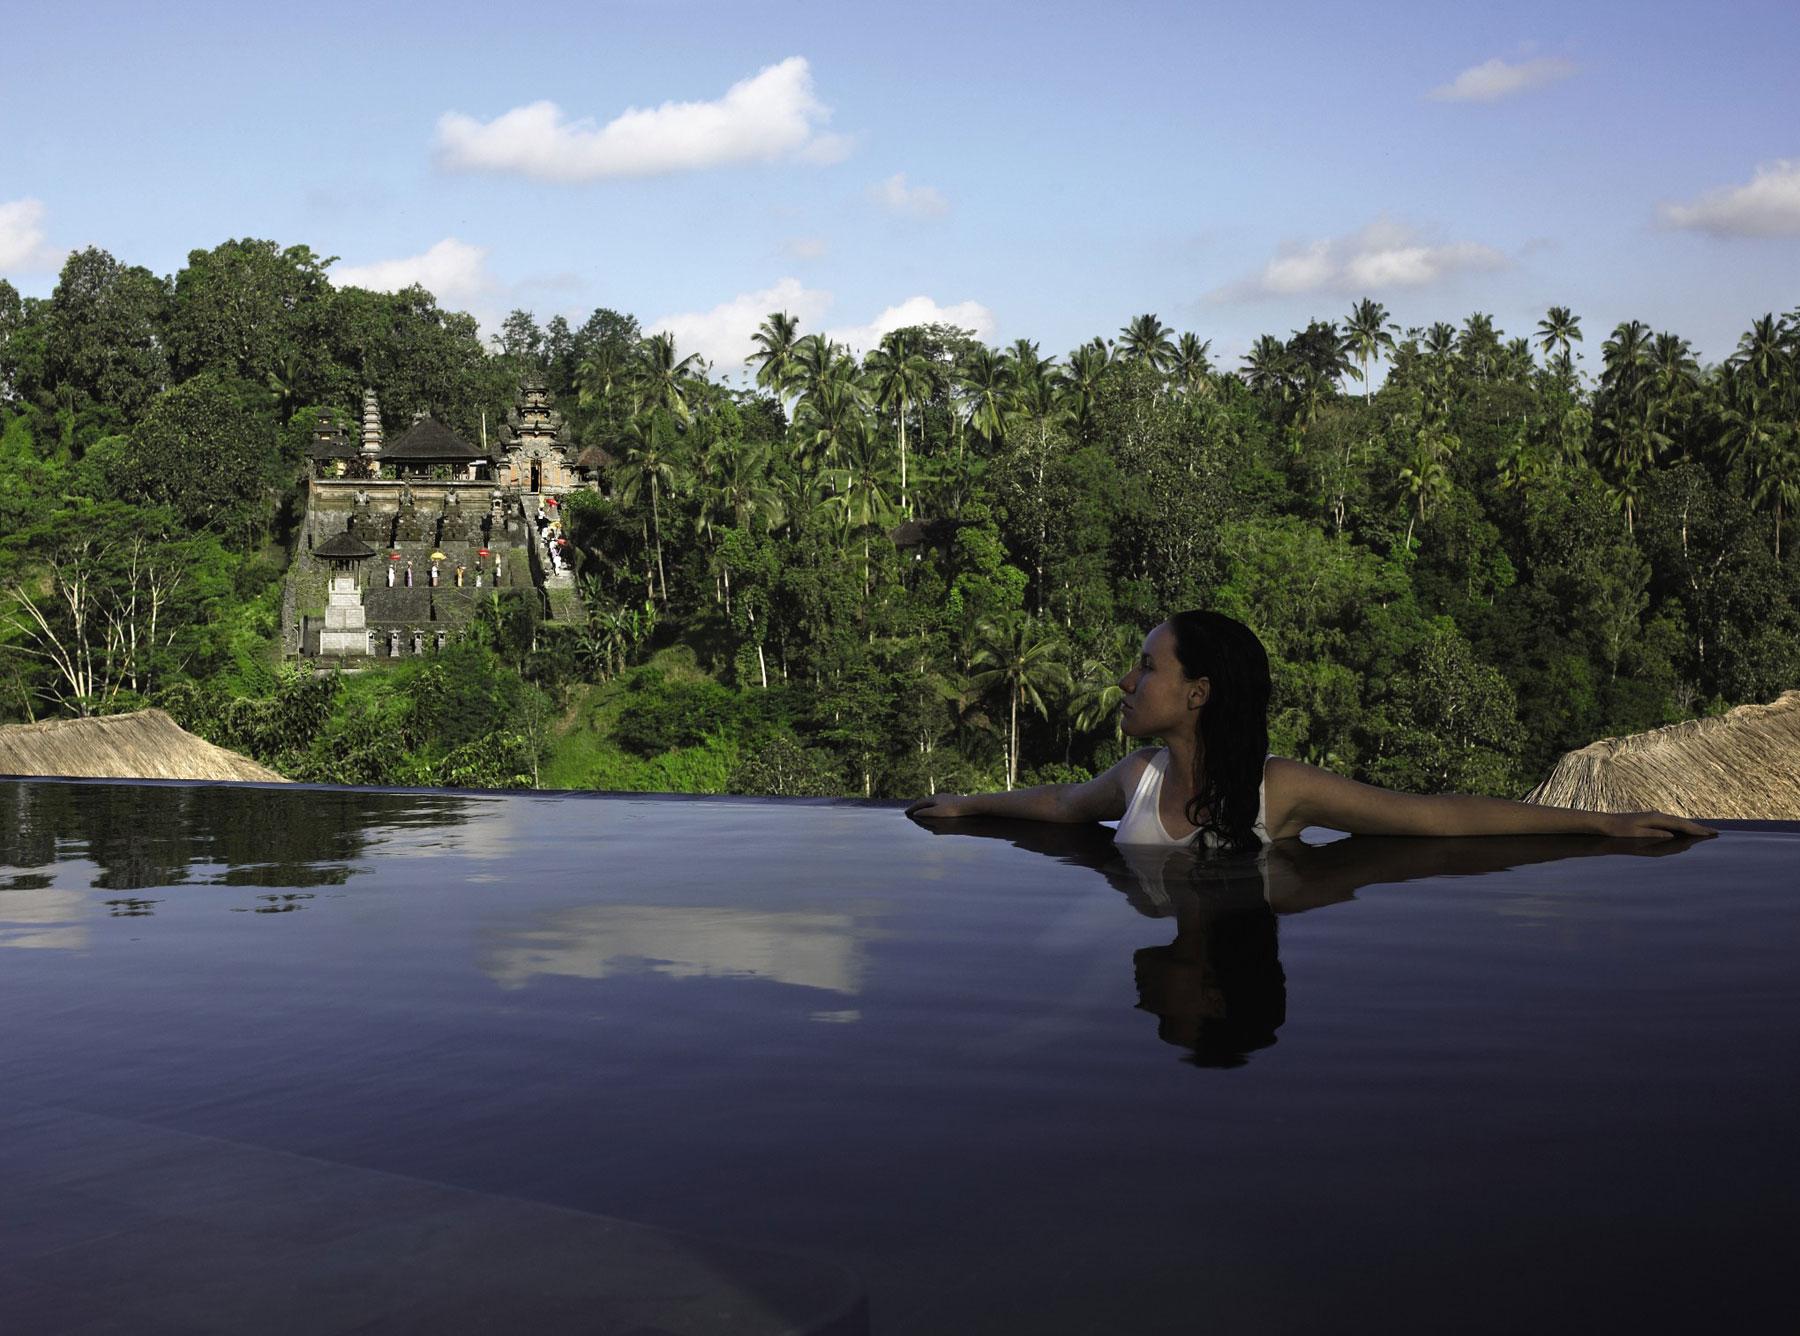 Hanging Infinity Pools In Bali At Ubud Hotel Amp Resort